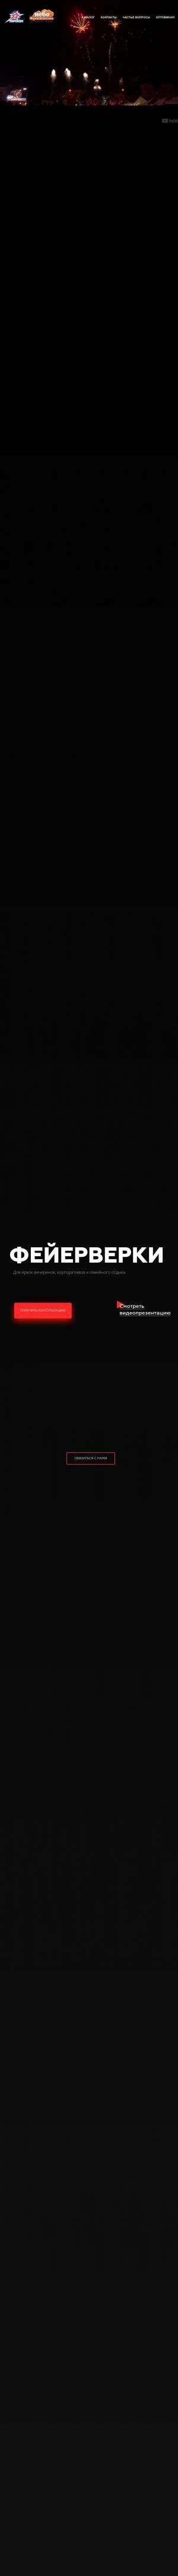 Предпросмотр для www.nebosalut.ru — Русский Фейерверк